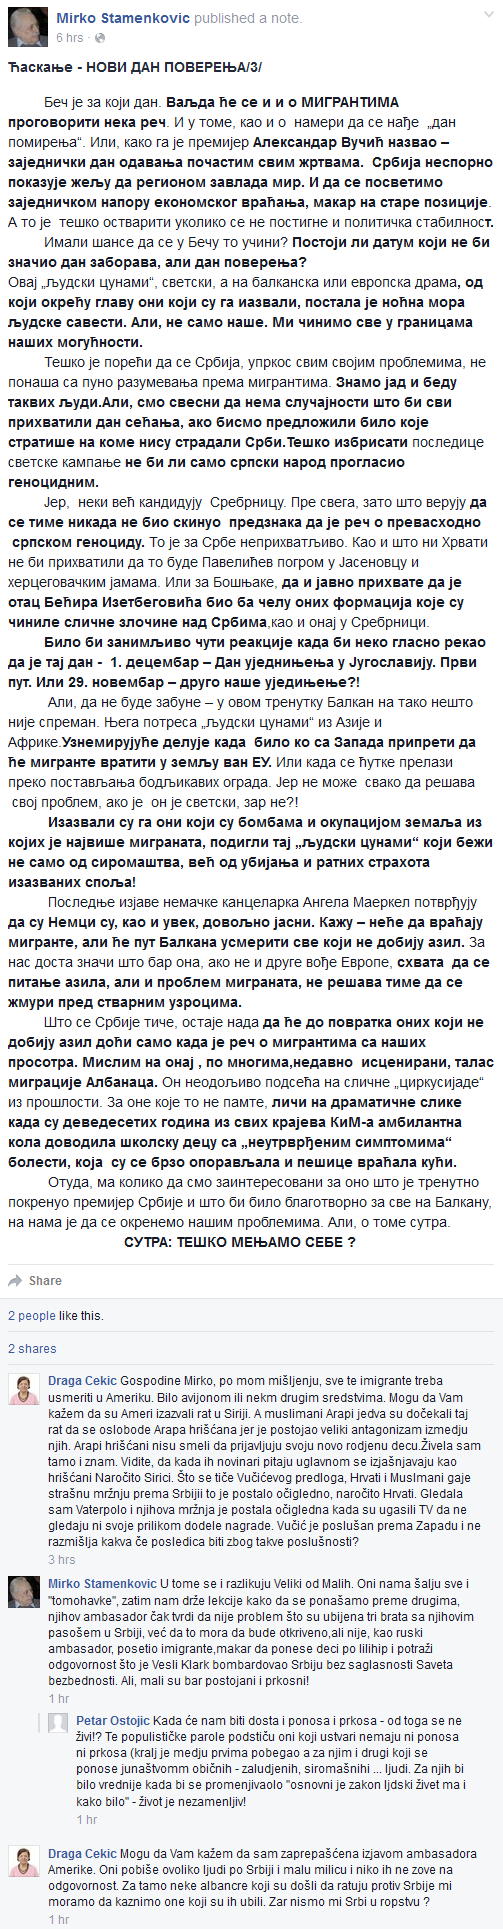 screenshot-www facebook com 2015-08-17 16-18-34